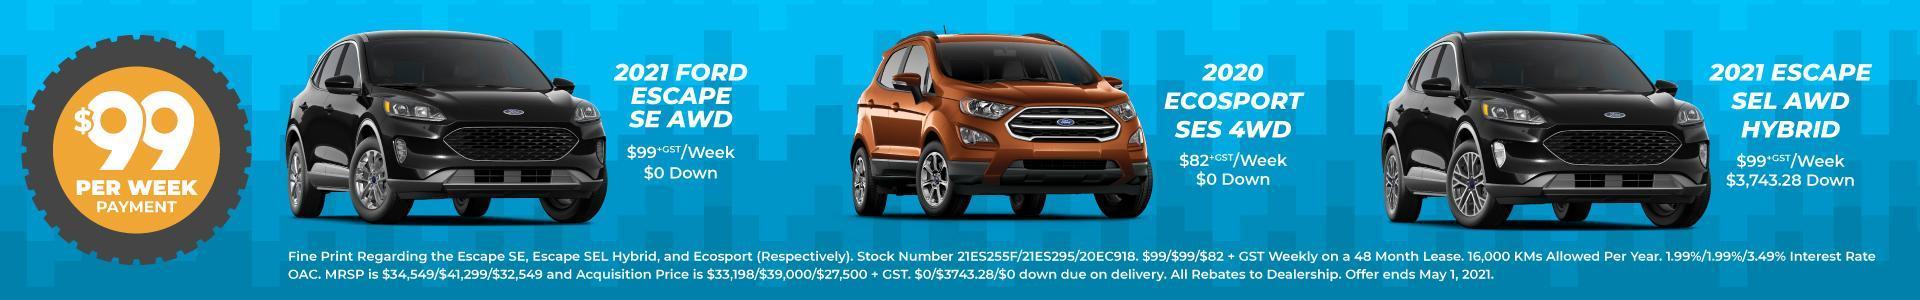 Choose your $99/Week SUV at Metro Ford Calgary